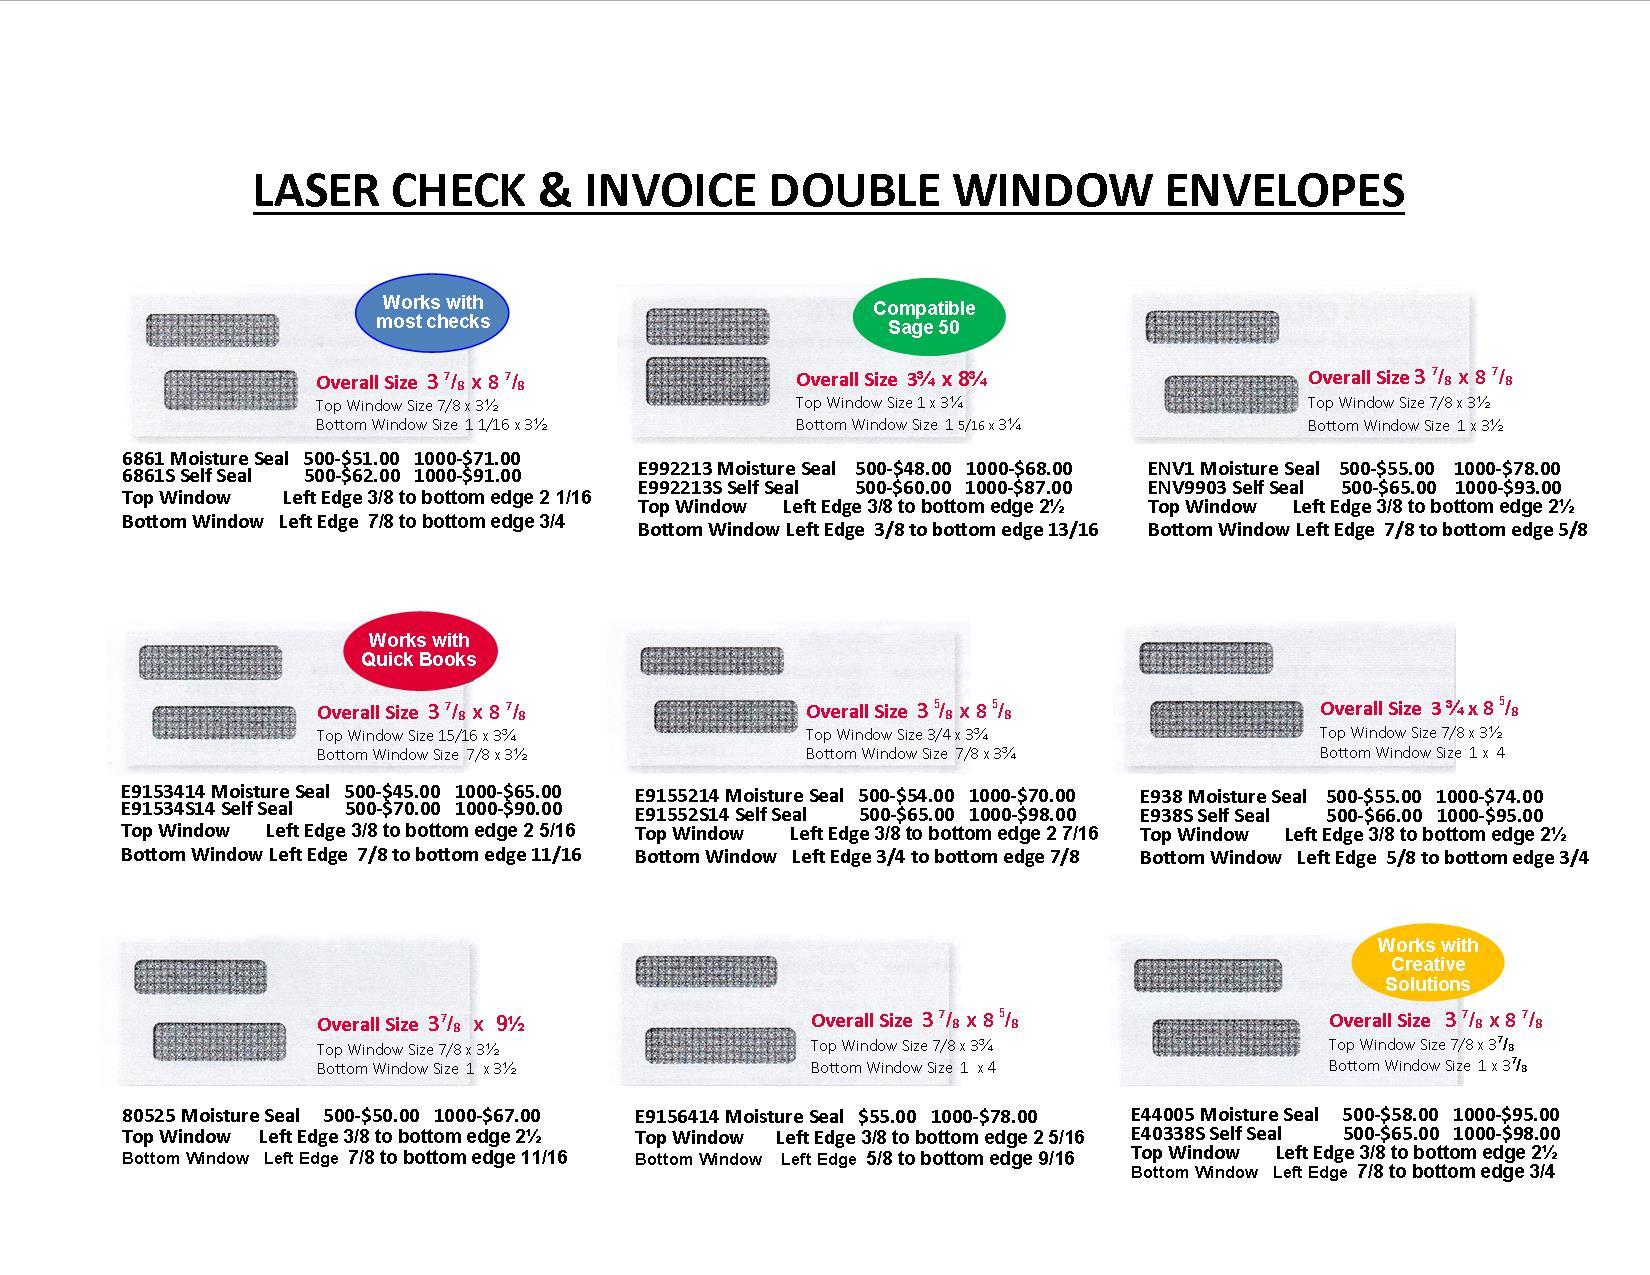 Double Window Envelopes Feld Printing Co - 9 invoice envelopes